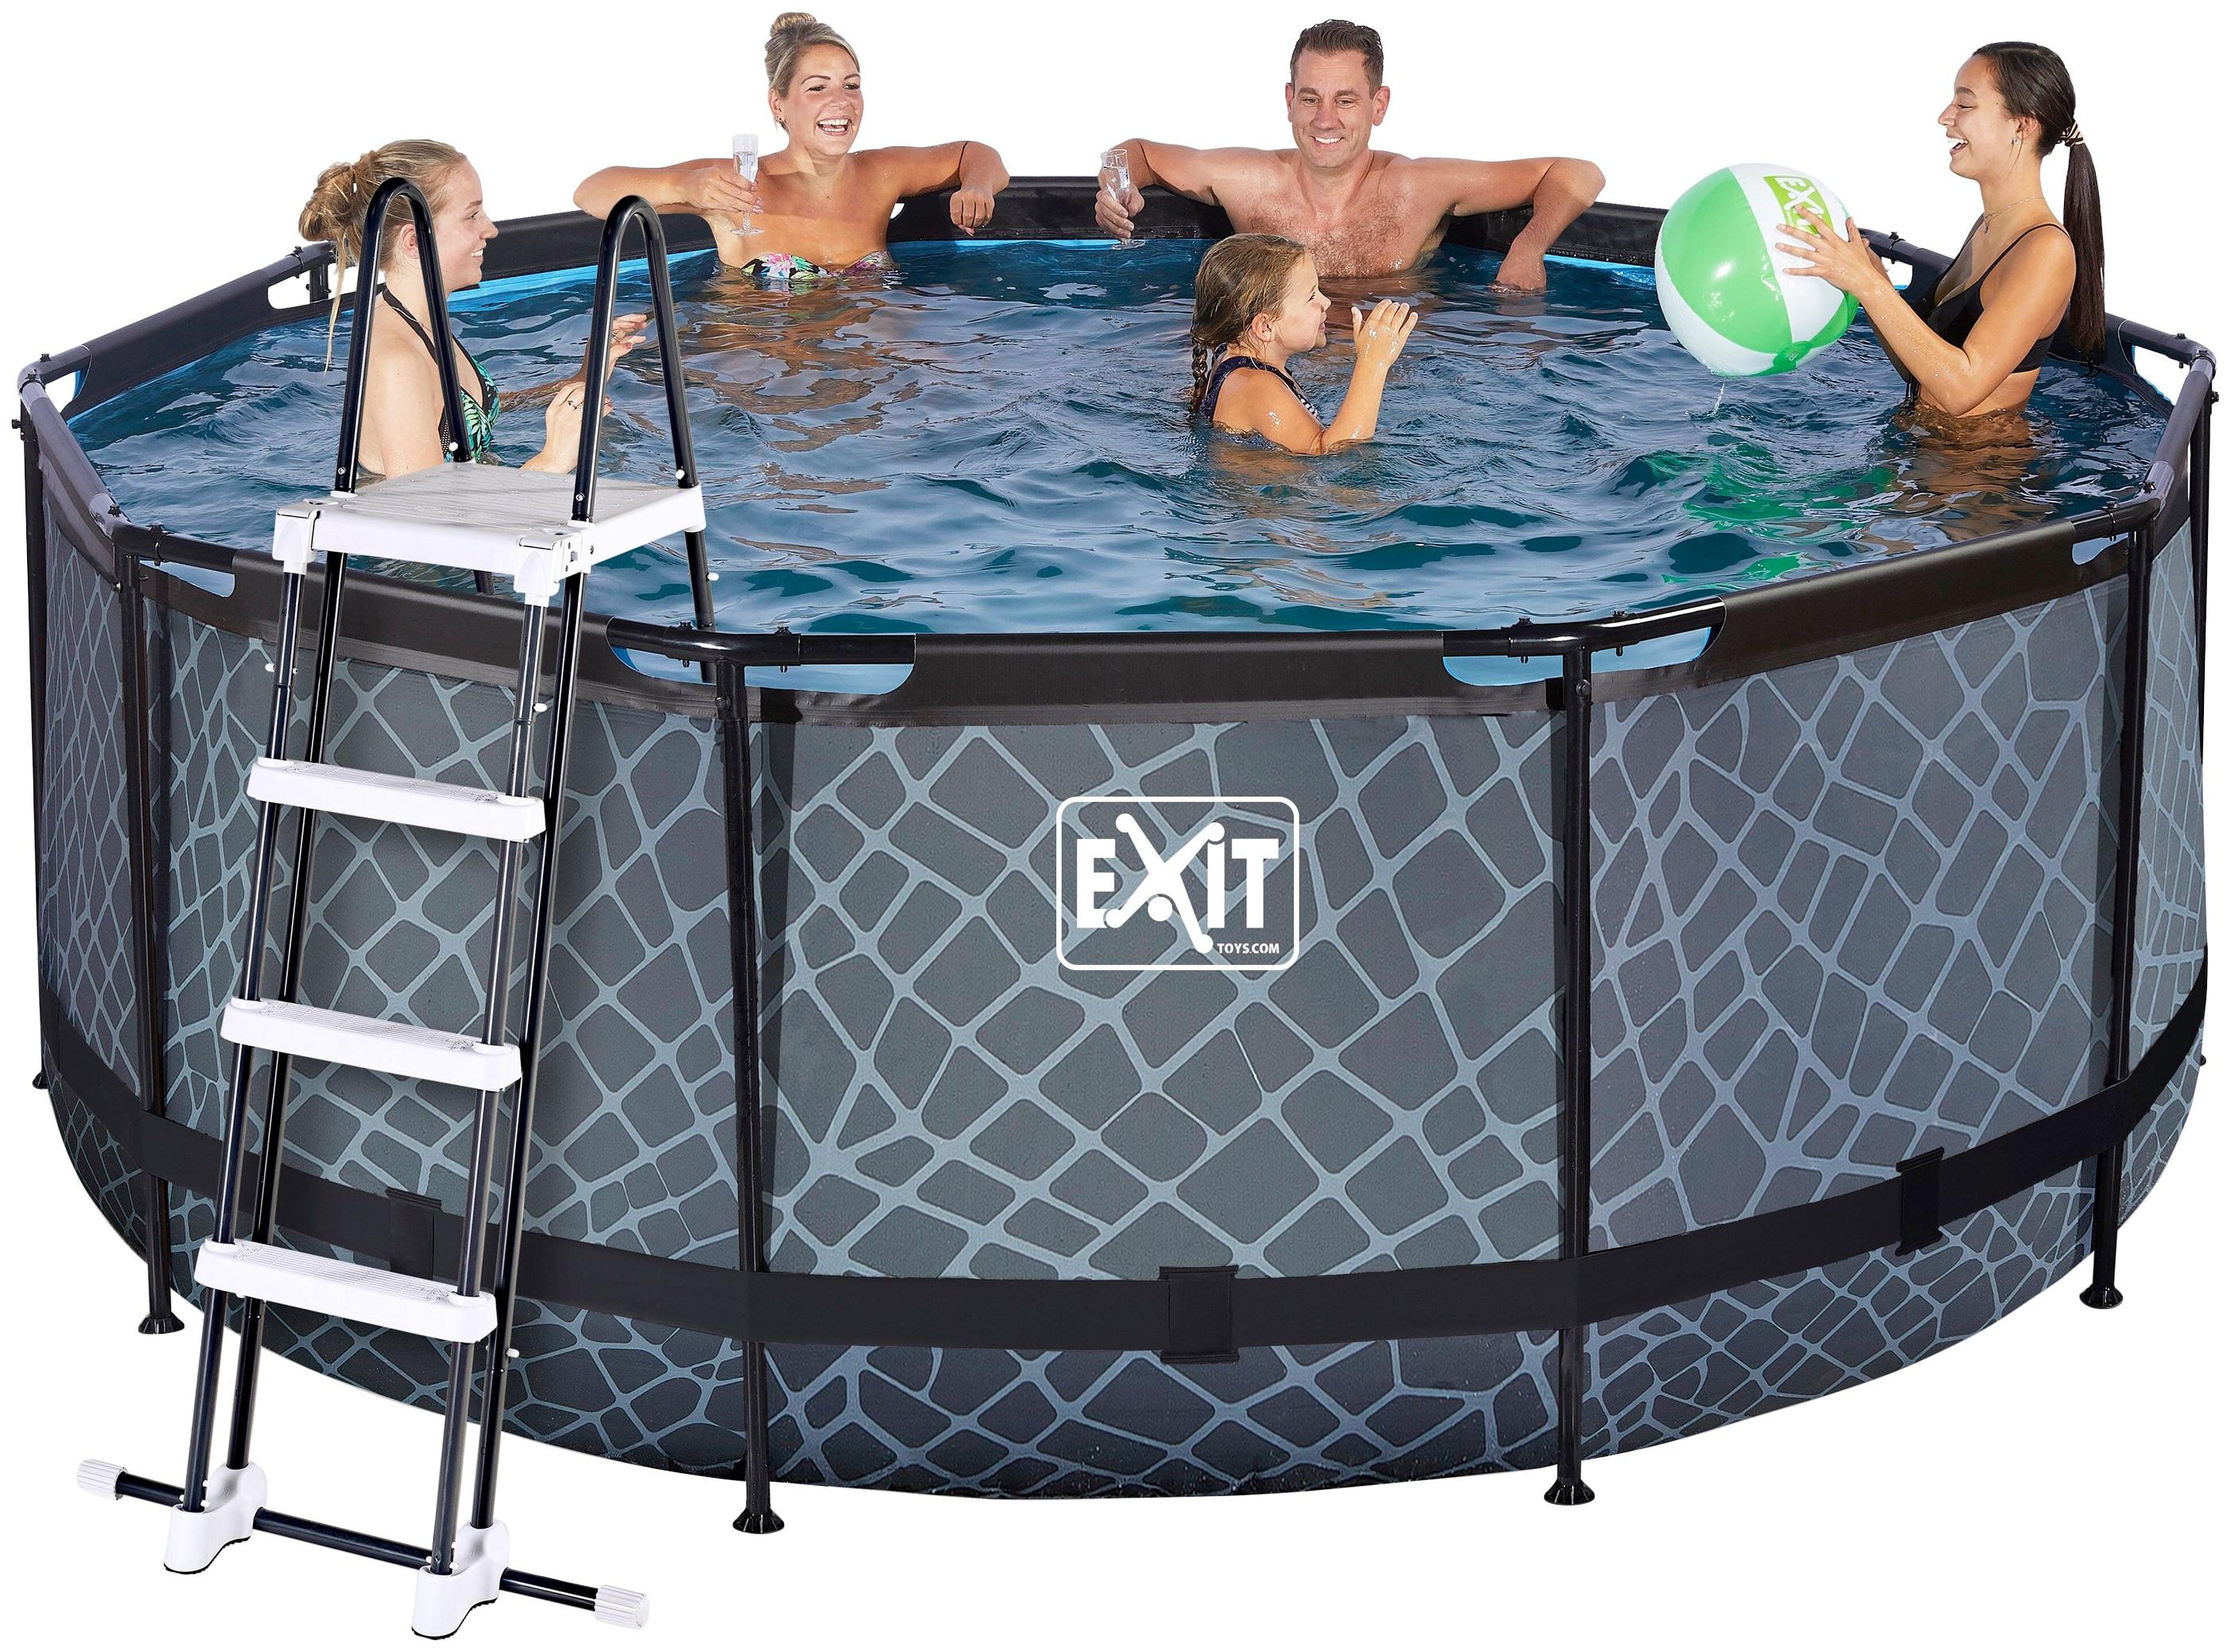 exit frame pool